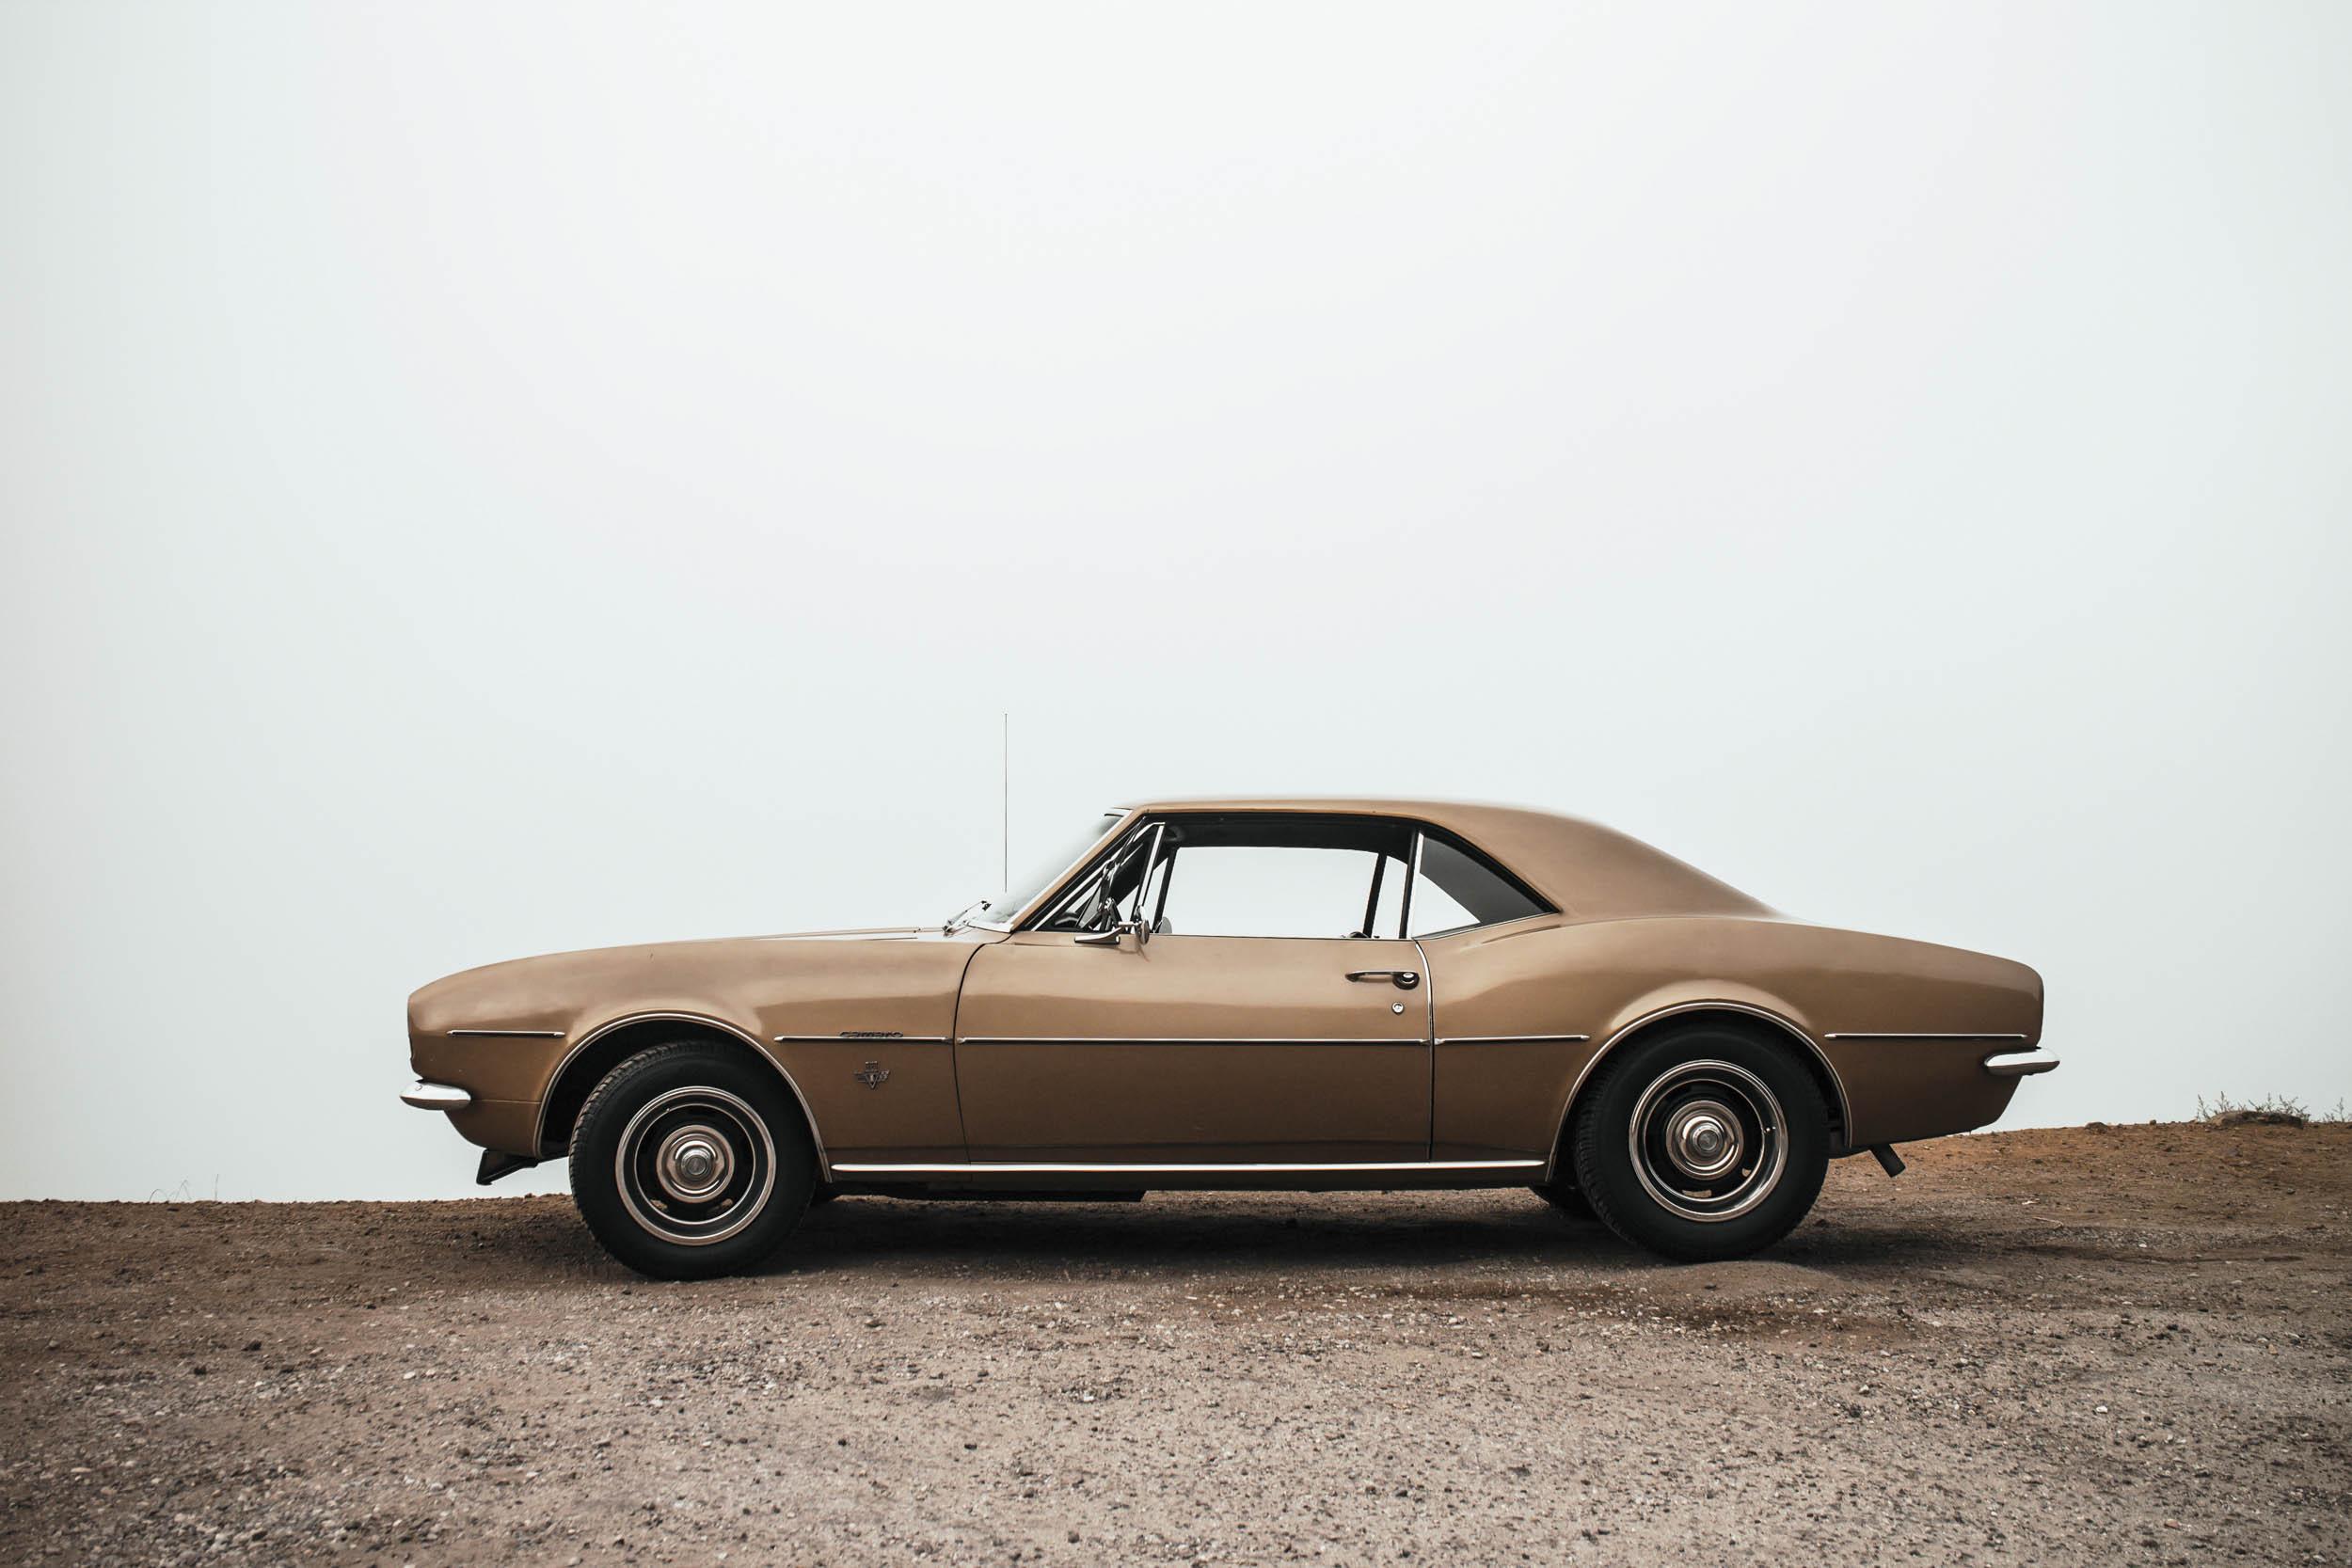 1967 Chevrolet Camaro profile